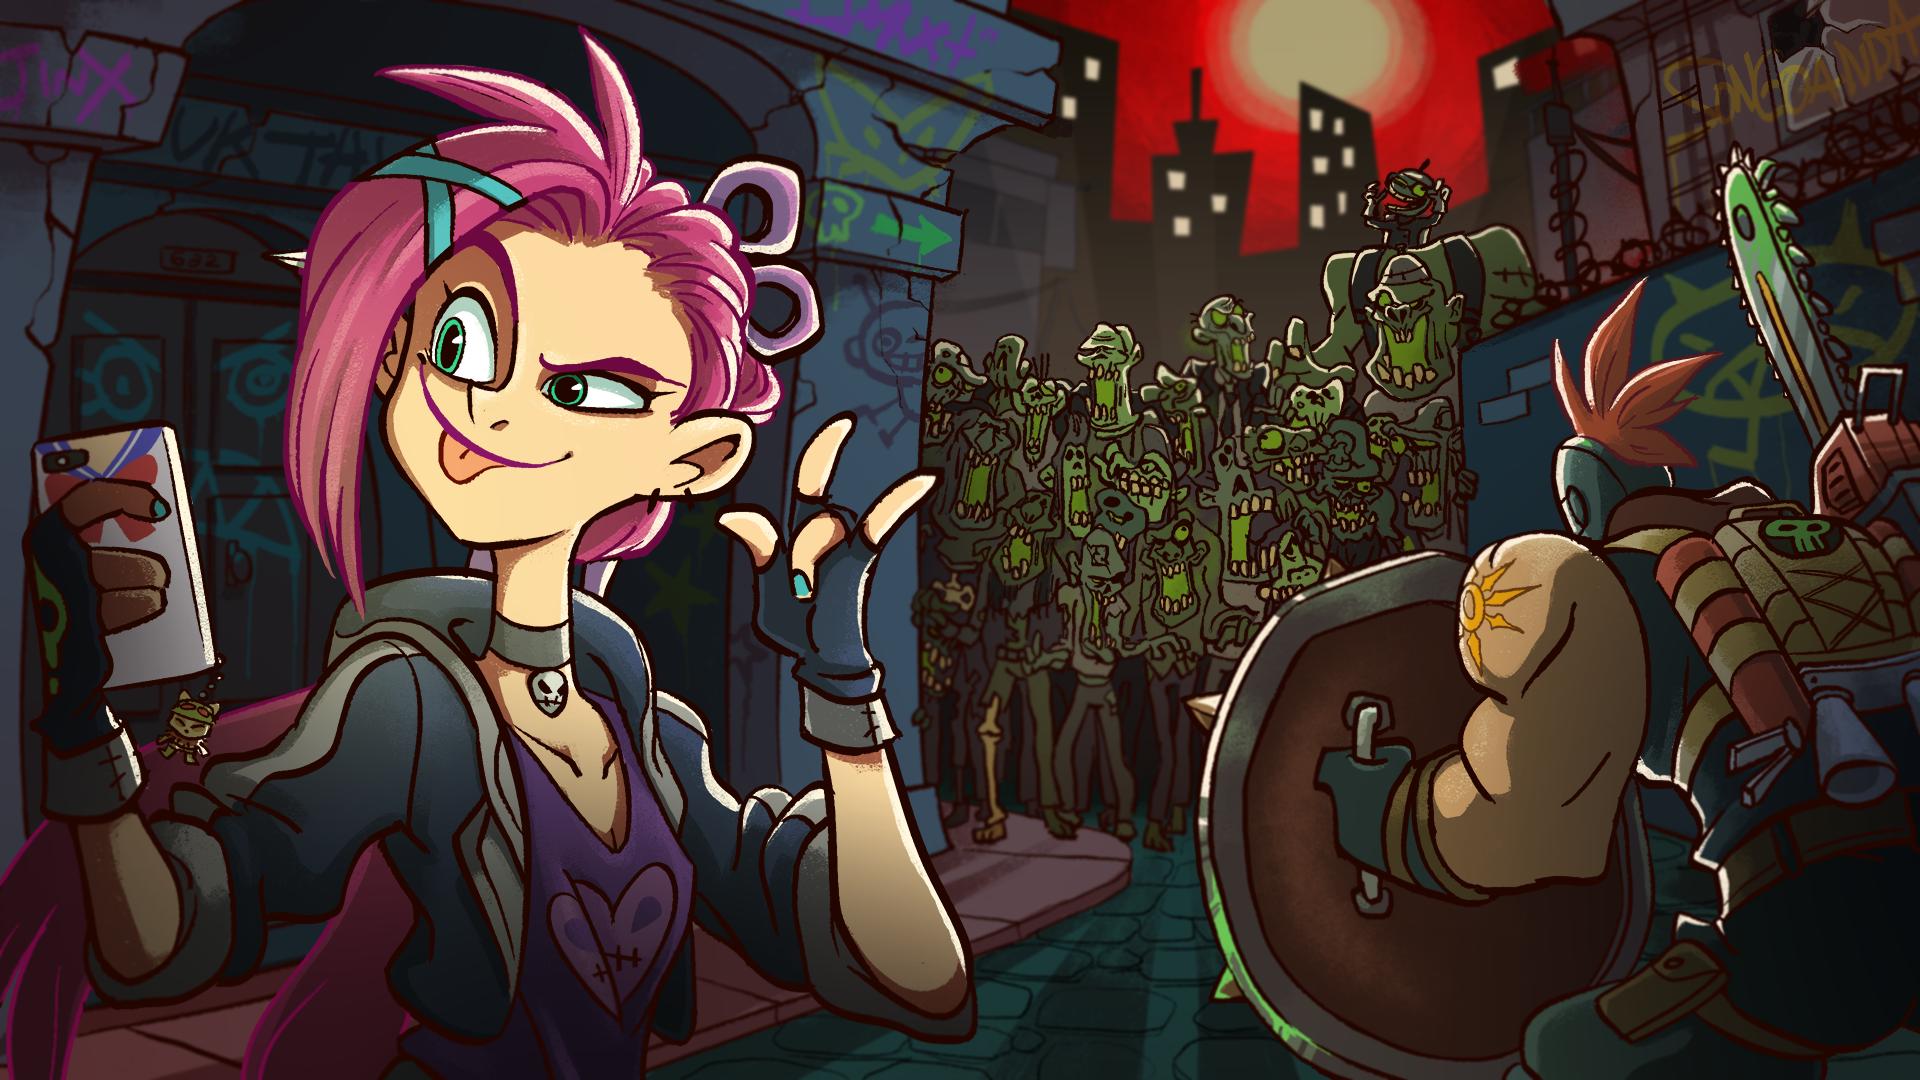 Zombie Slayers By Songoanda Zombie Slayers By Songoanda